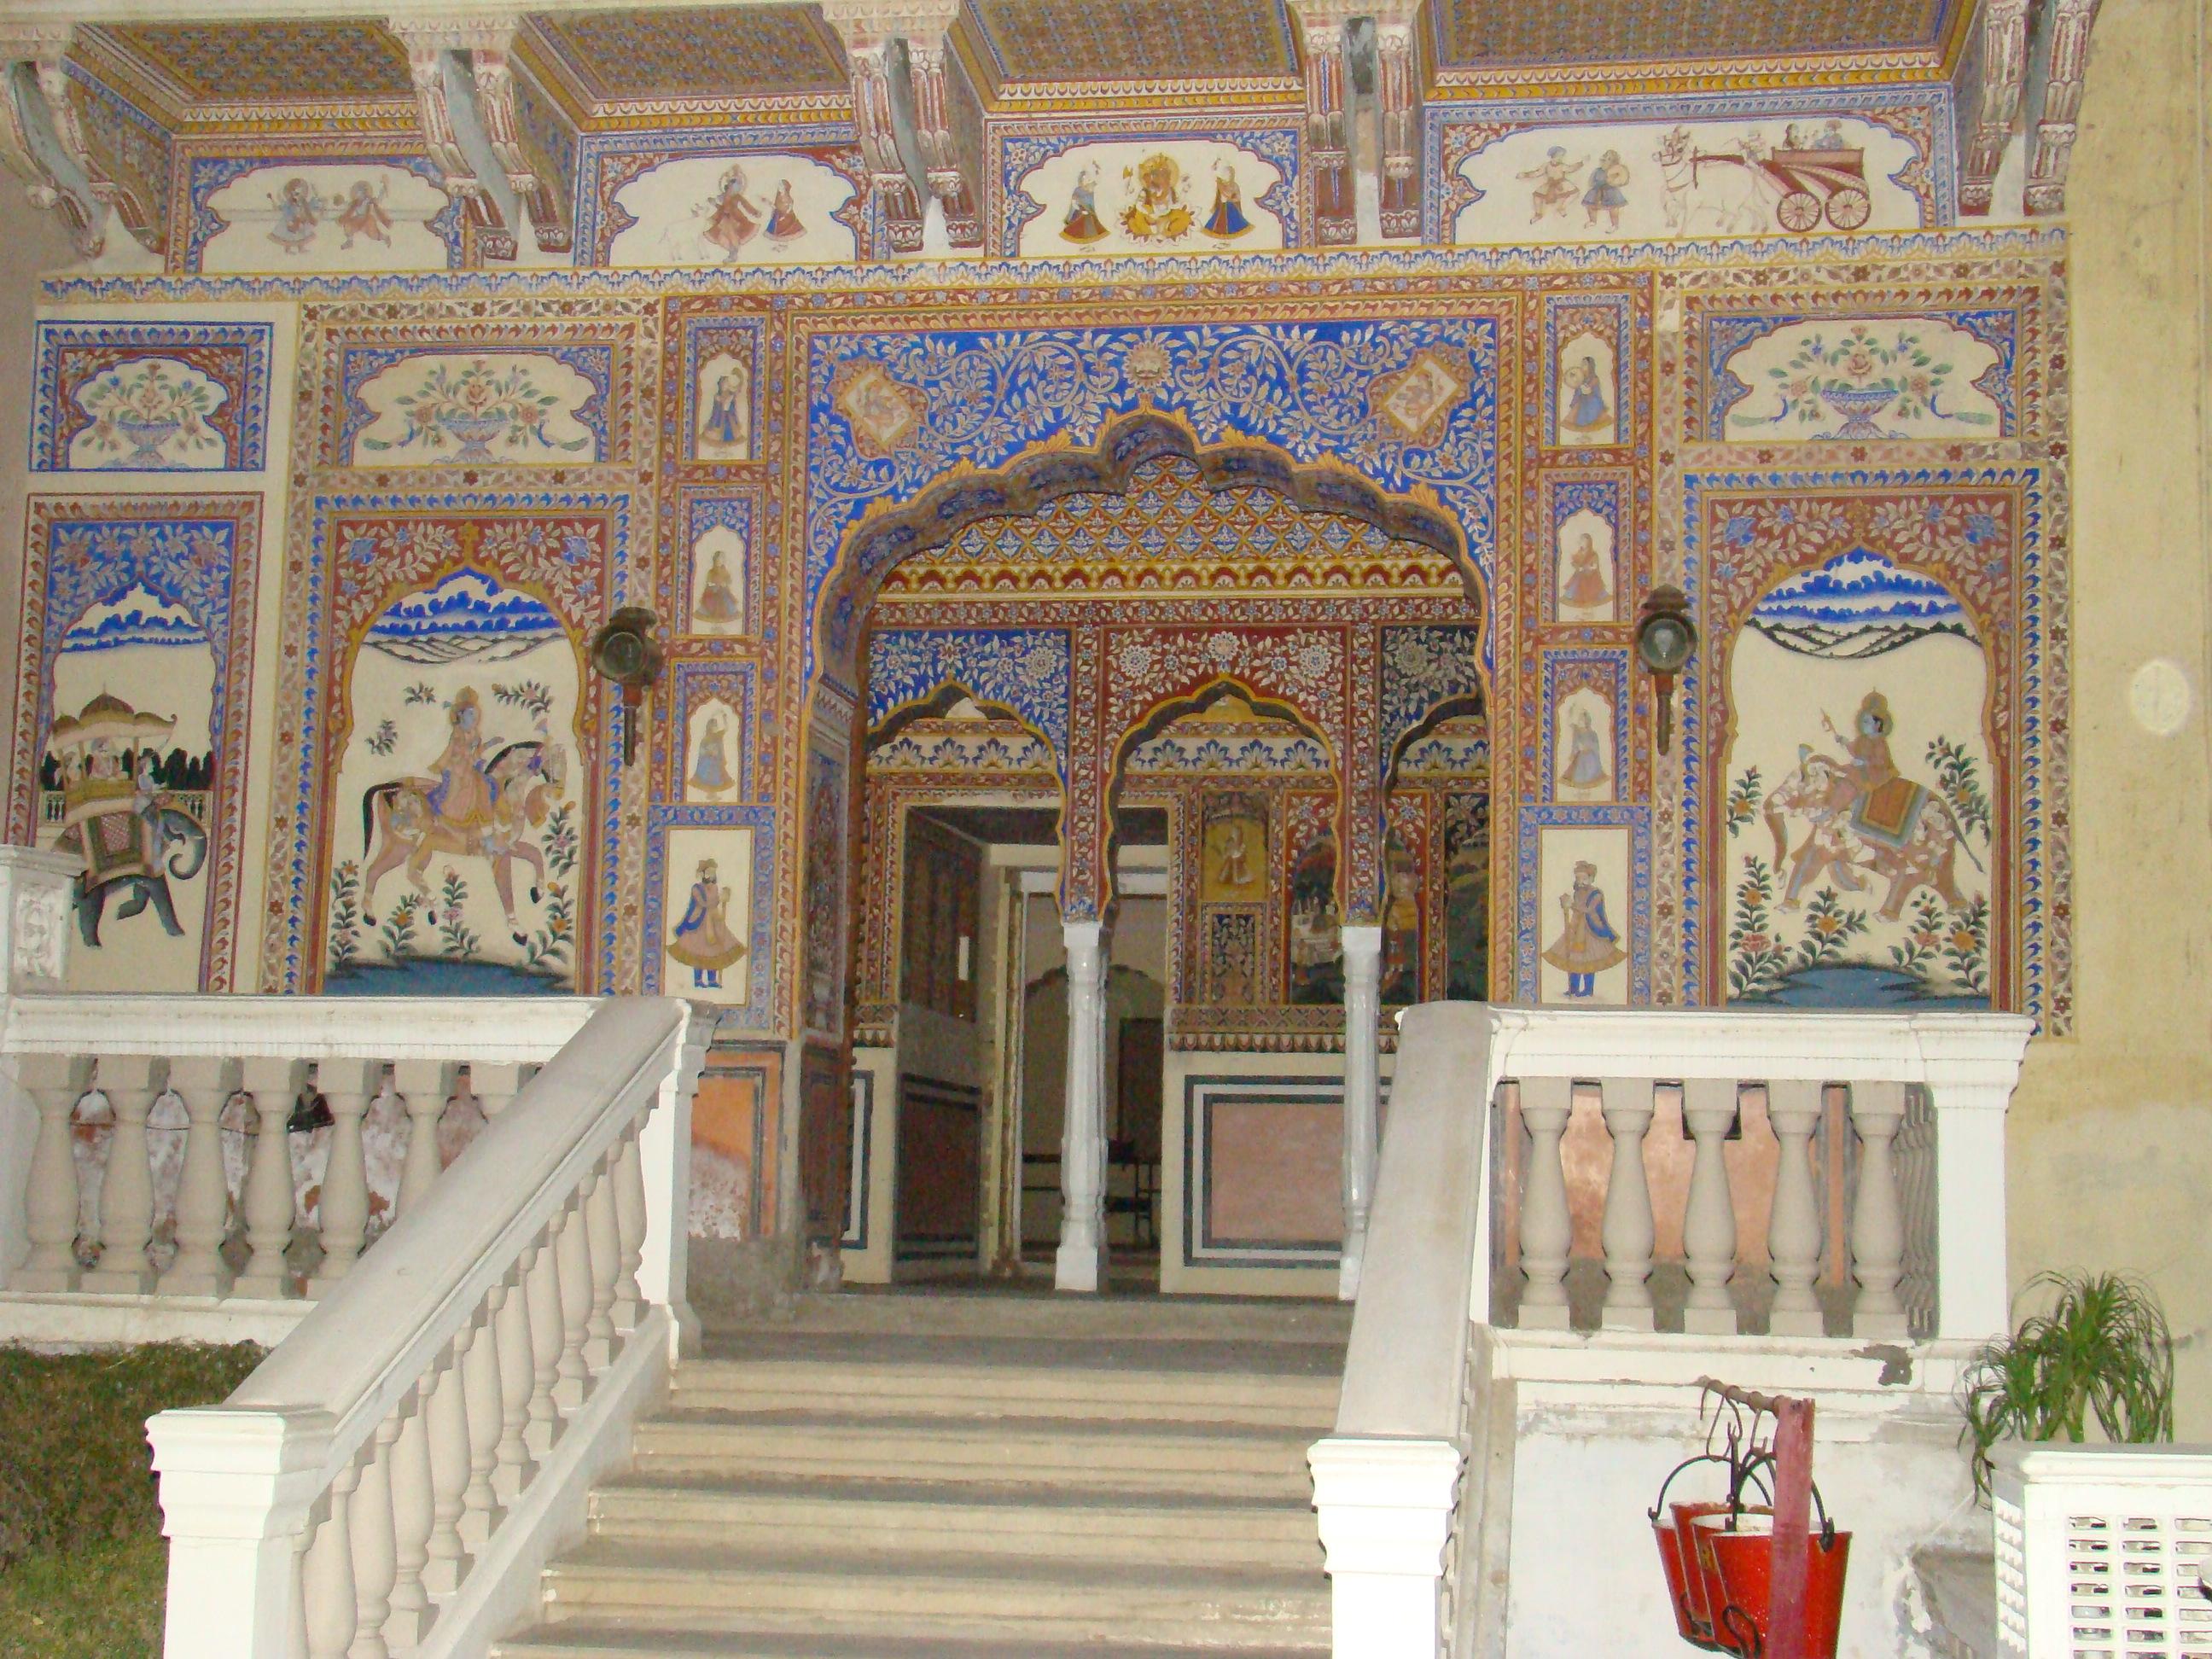 Mandawa India  city photos : Description India Mandawa fuerte palacio 03 ni